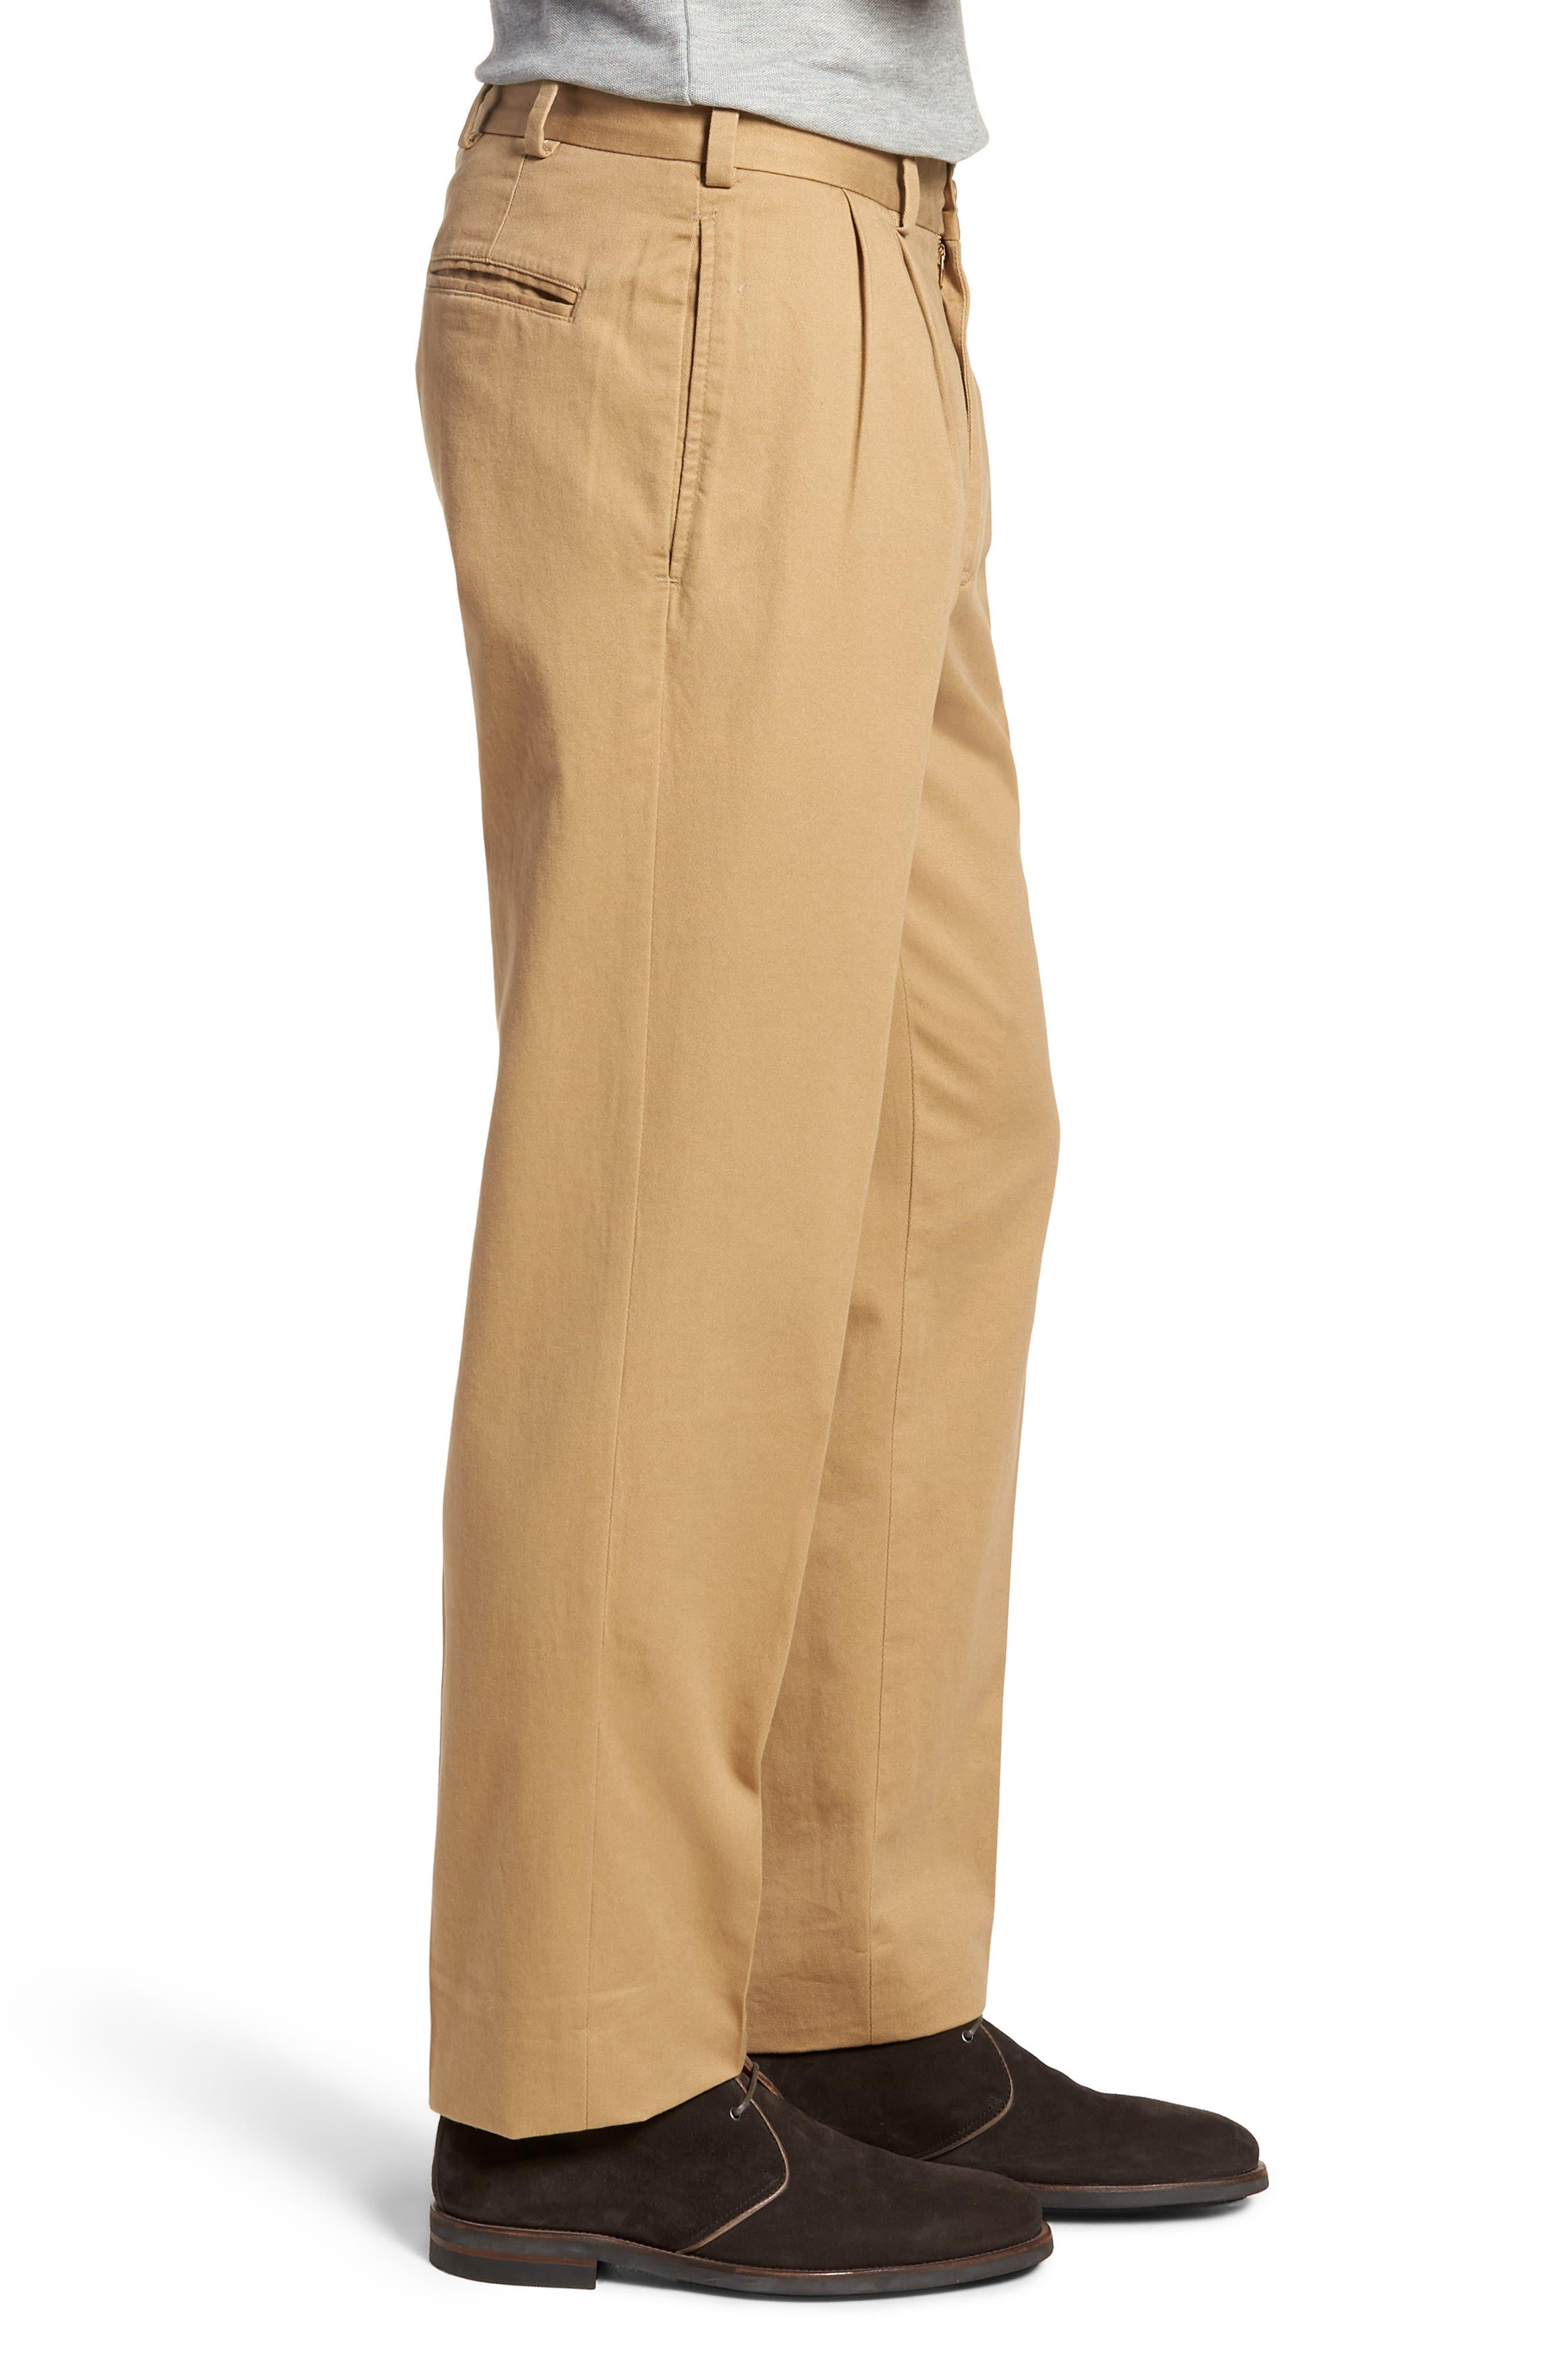 M2 Classic Fit Pleated Vintage Twill Pants,                             Alternate thumbnail 3, color,                             BRITISH KHAKI